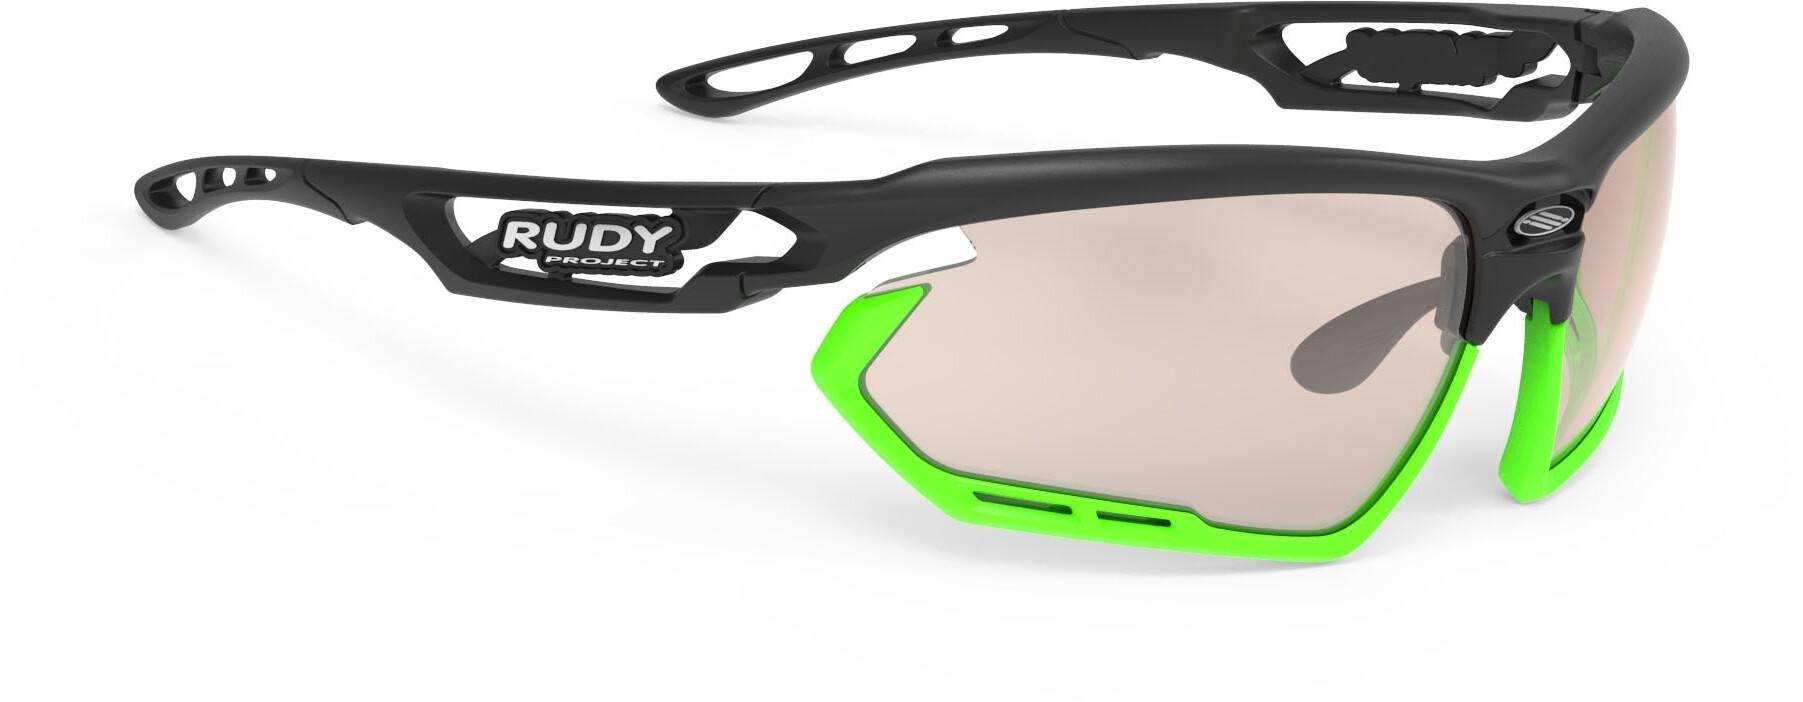 Rudy Project Fotonyk Cykelbriller, black matte - impactx photochromic 2 laser brown | Briller